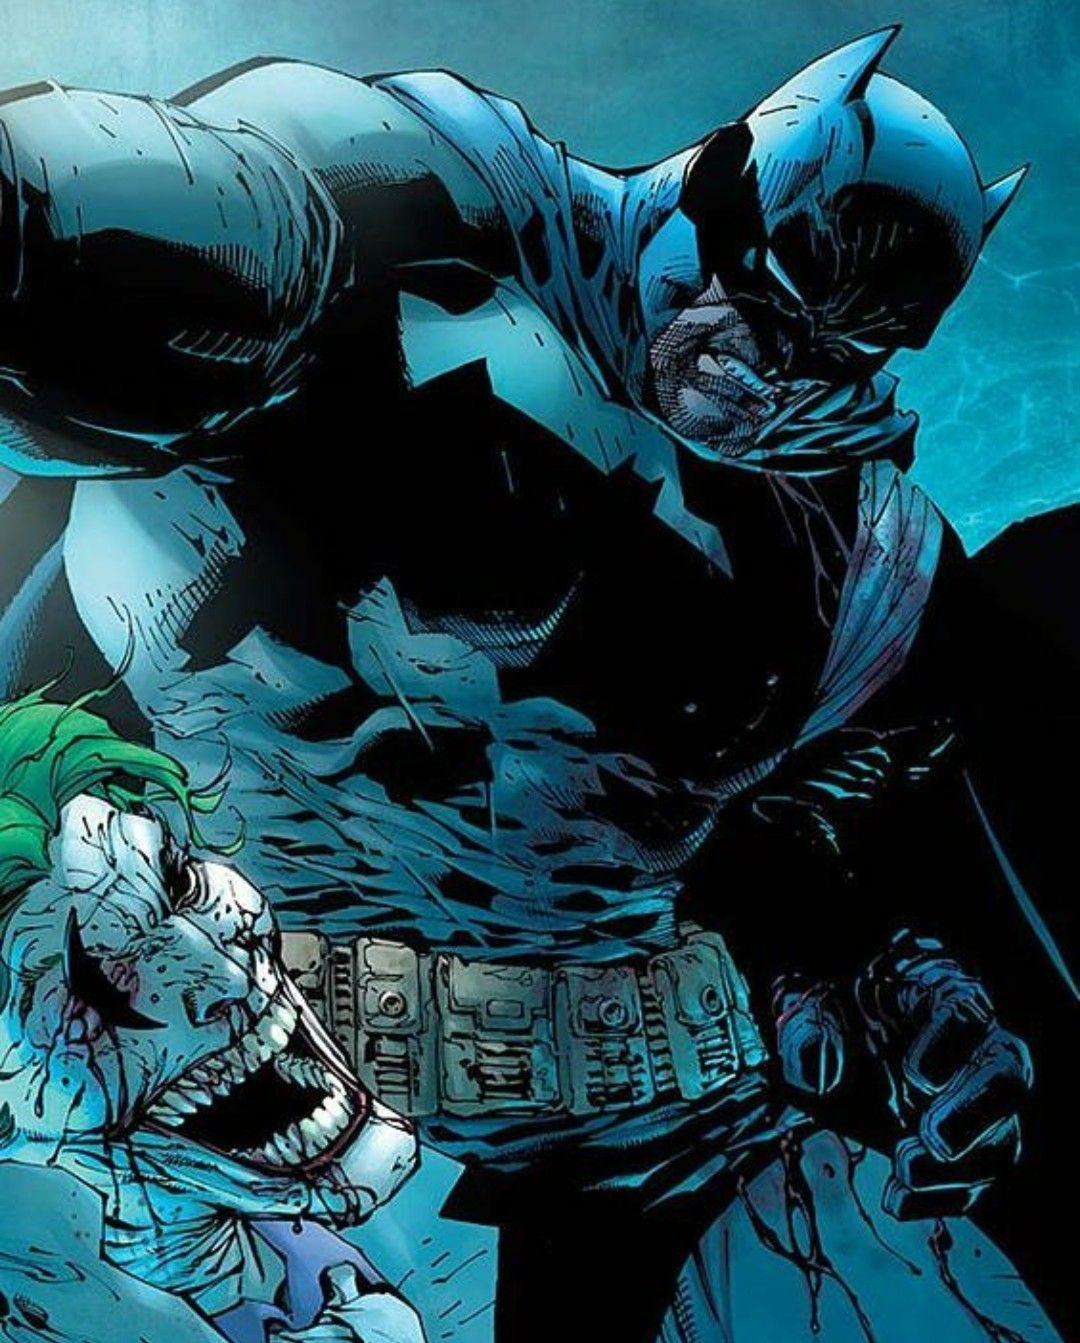 Batman Vs Joker From The Dark Knight Returns | Batman ...